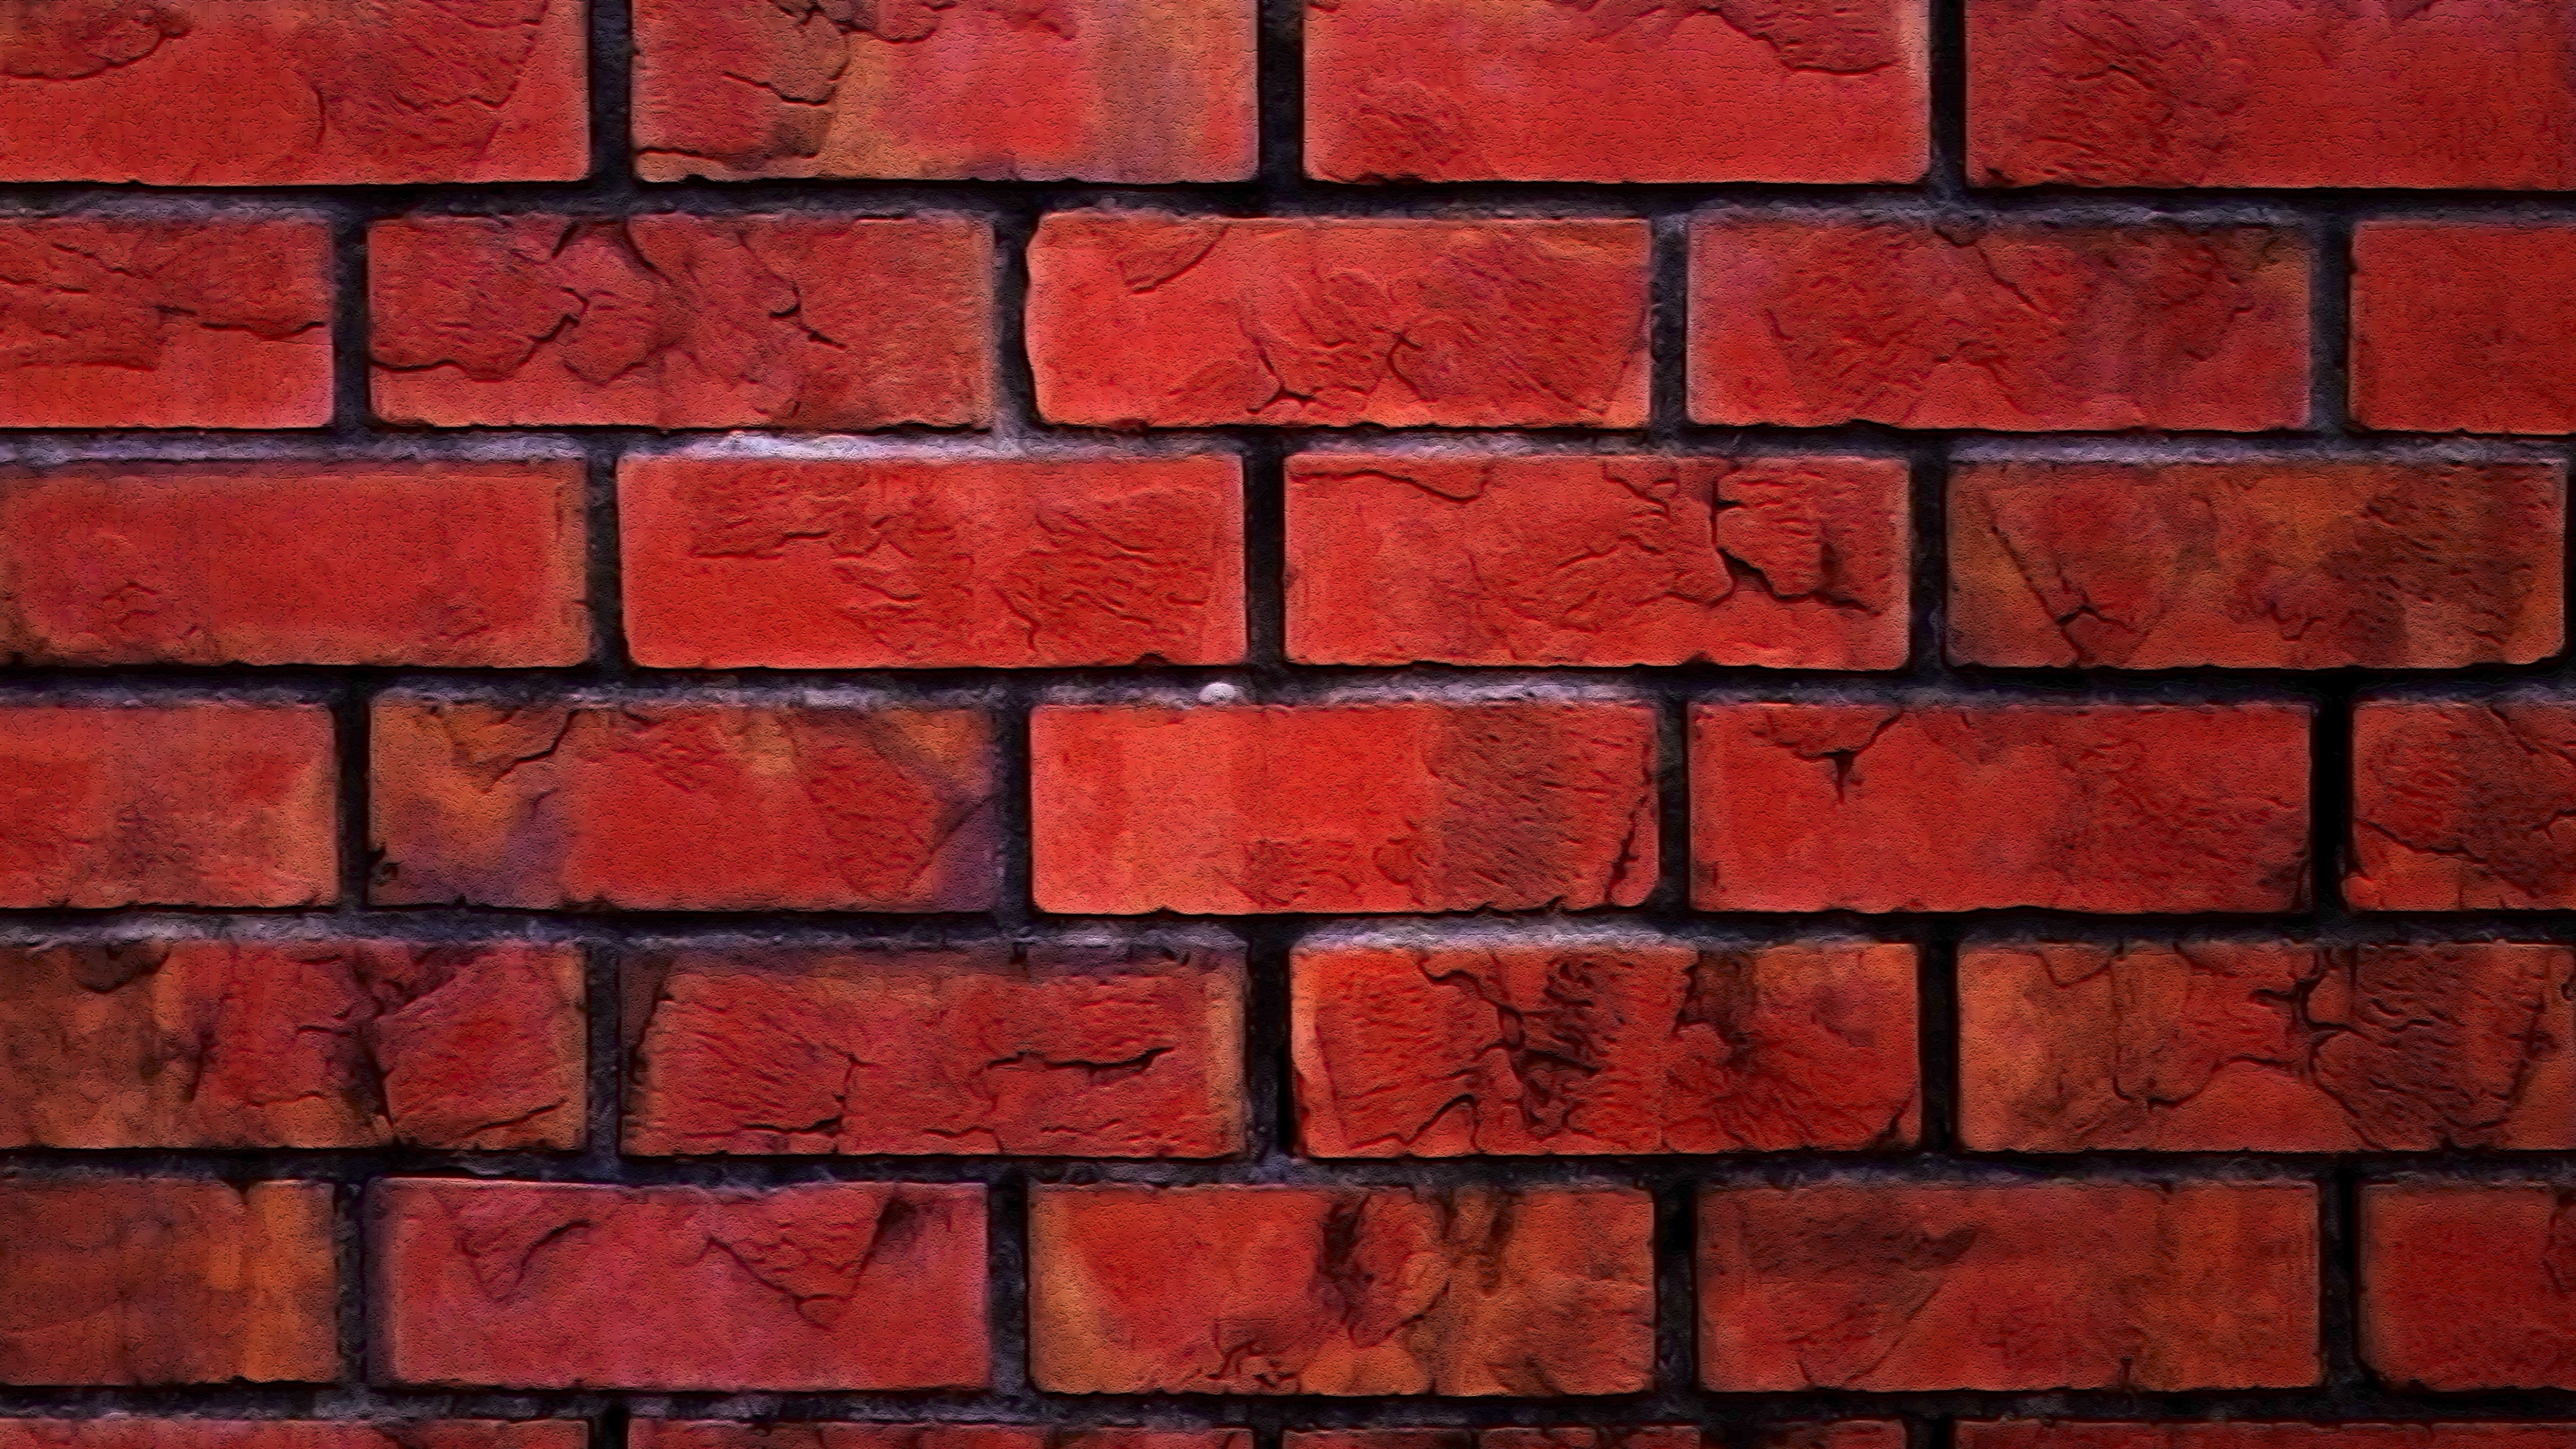 bricks wall background 4k 1536097849 - bricks, wall, background 4k - WALL, bricks, Background